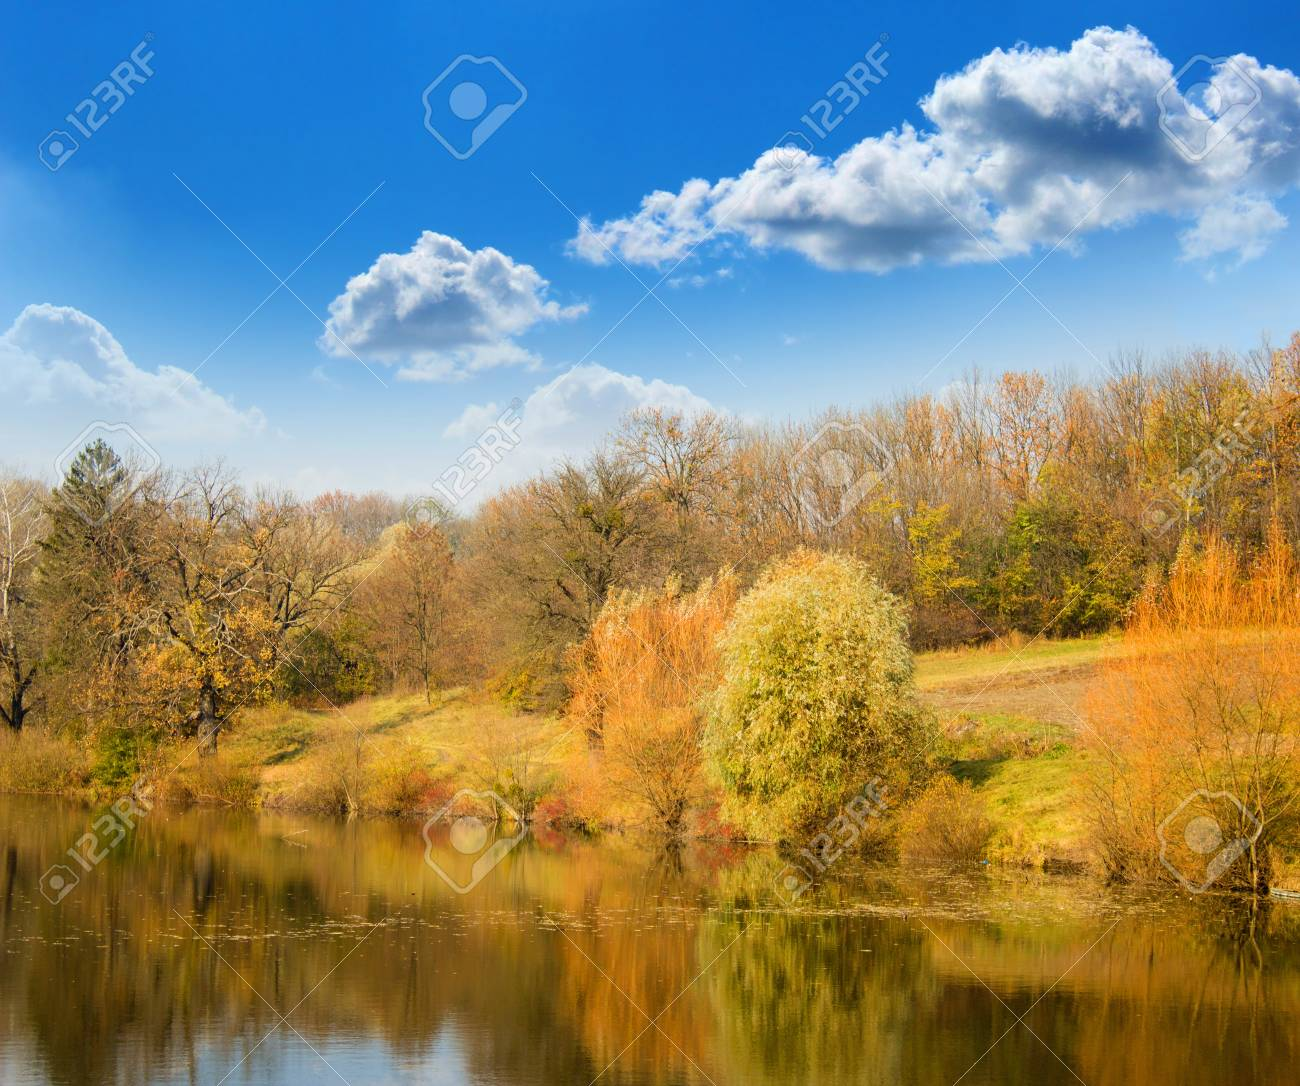 Autumn landscape on the bank of lake Stock Photo - 14692194